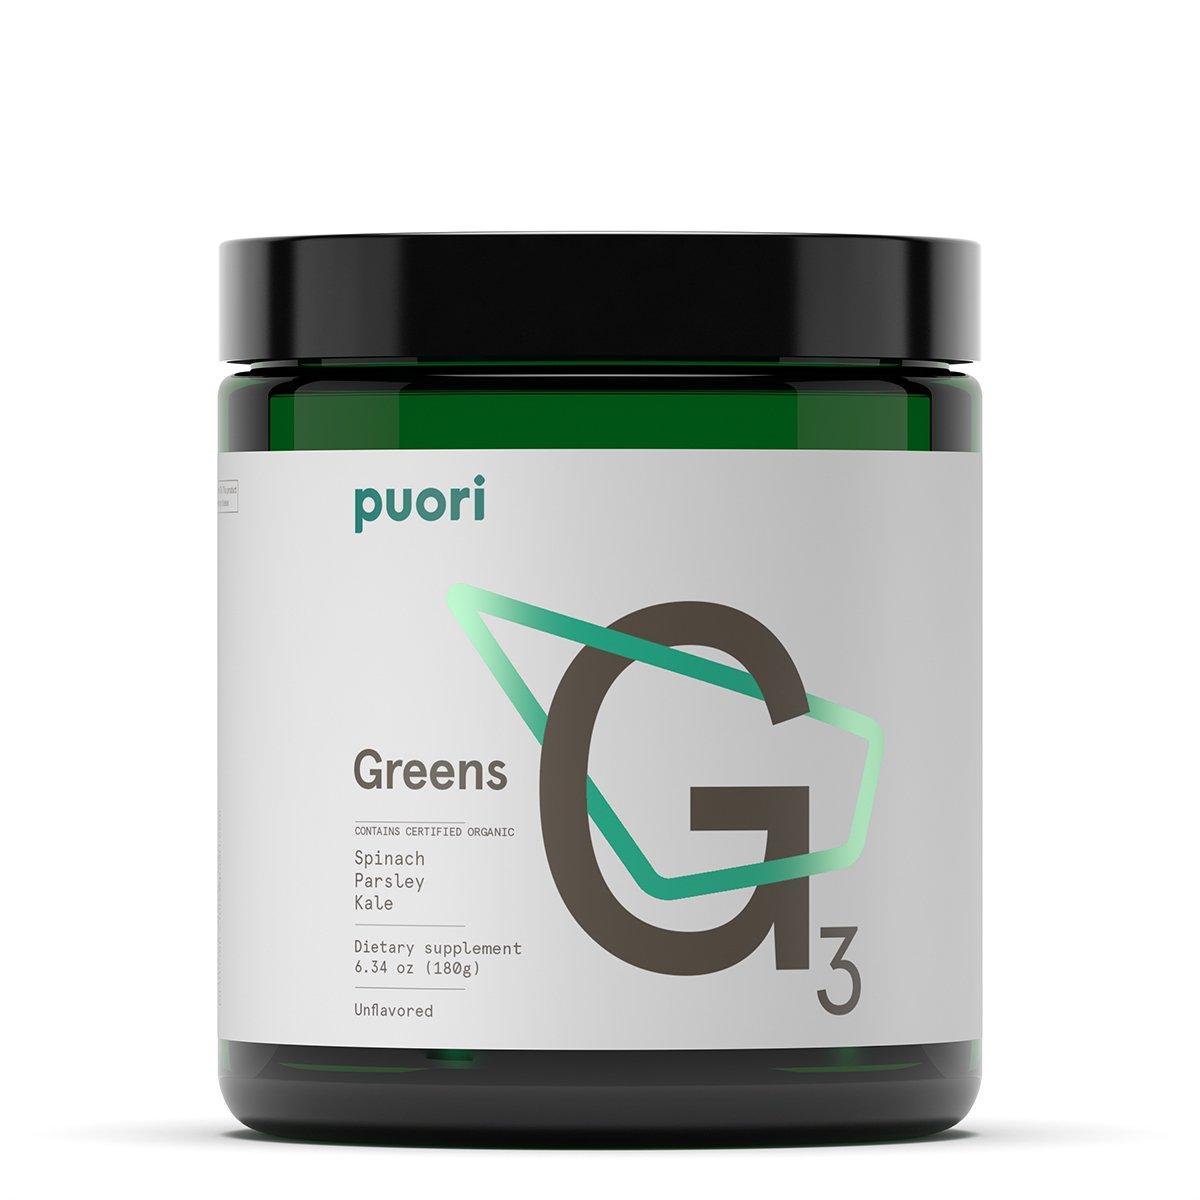 G3 Organic Green Powder [ Kale, Spinach, Parsley ] | 7.93oz (225g) | 30 Vegan Servings